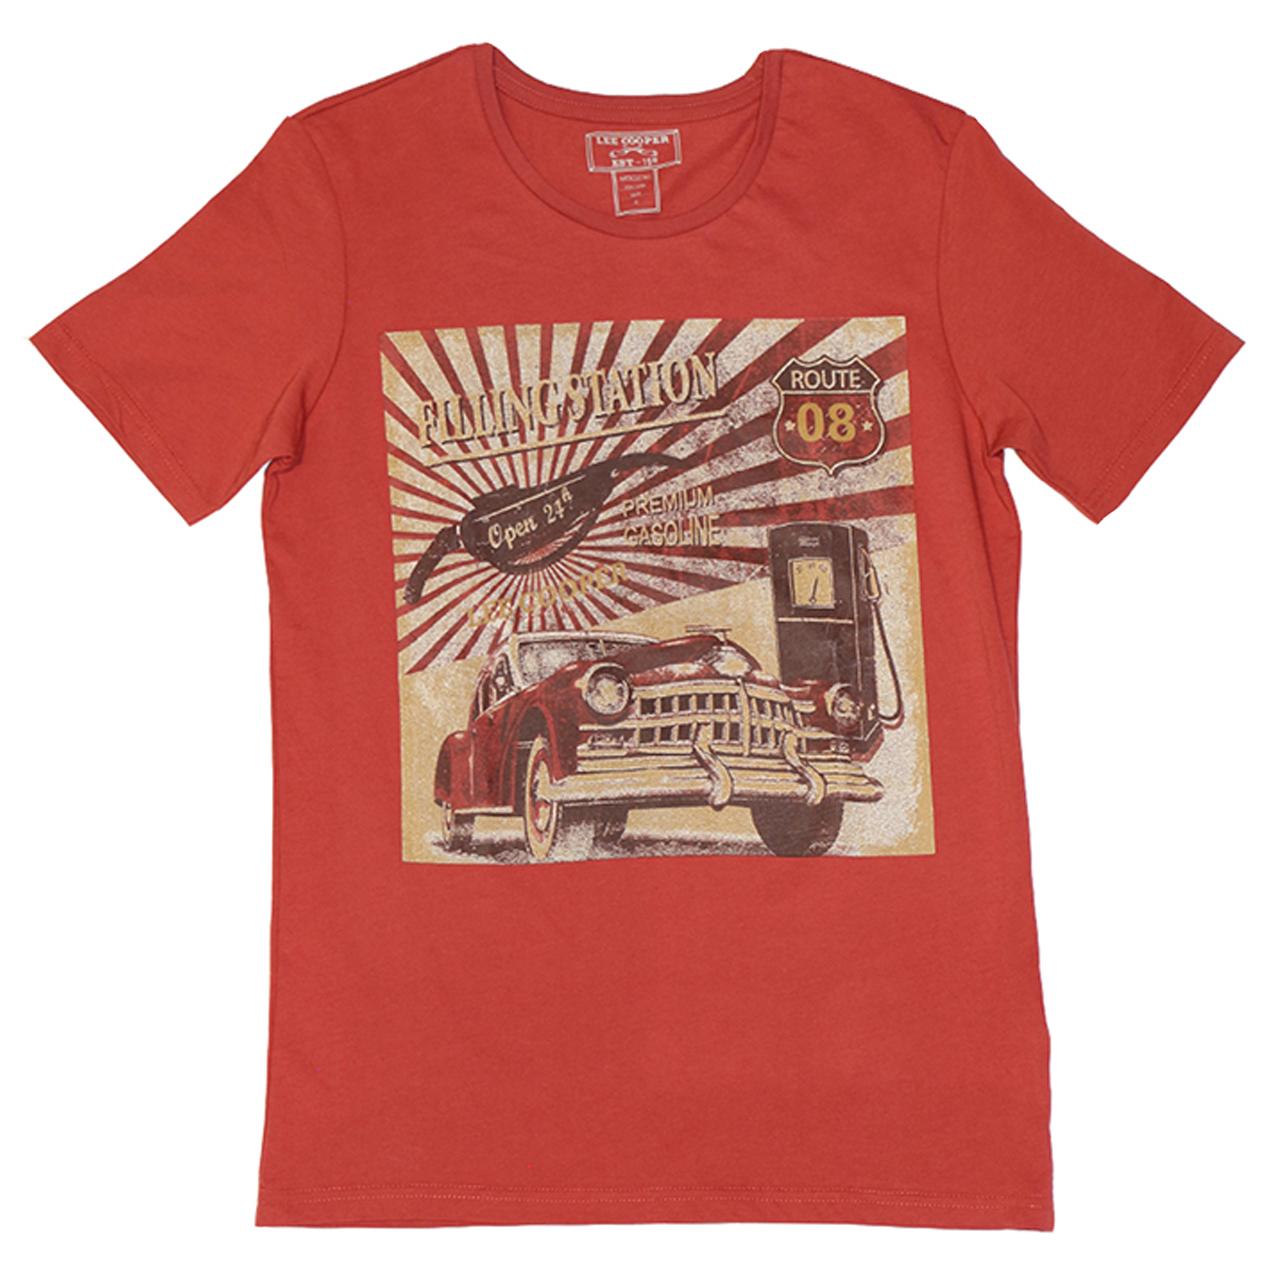 تی شرت مردانه لی کوپر مدل Filling Car